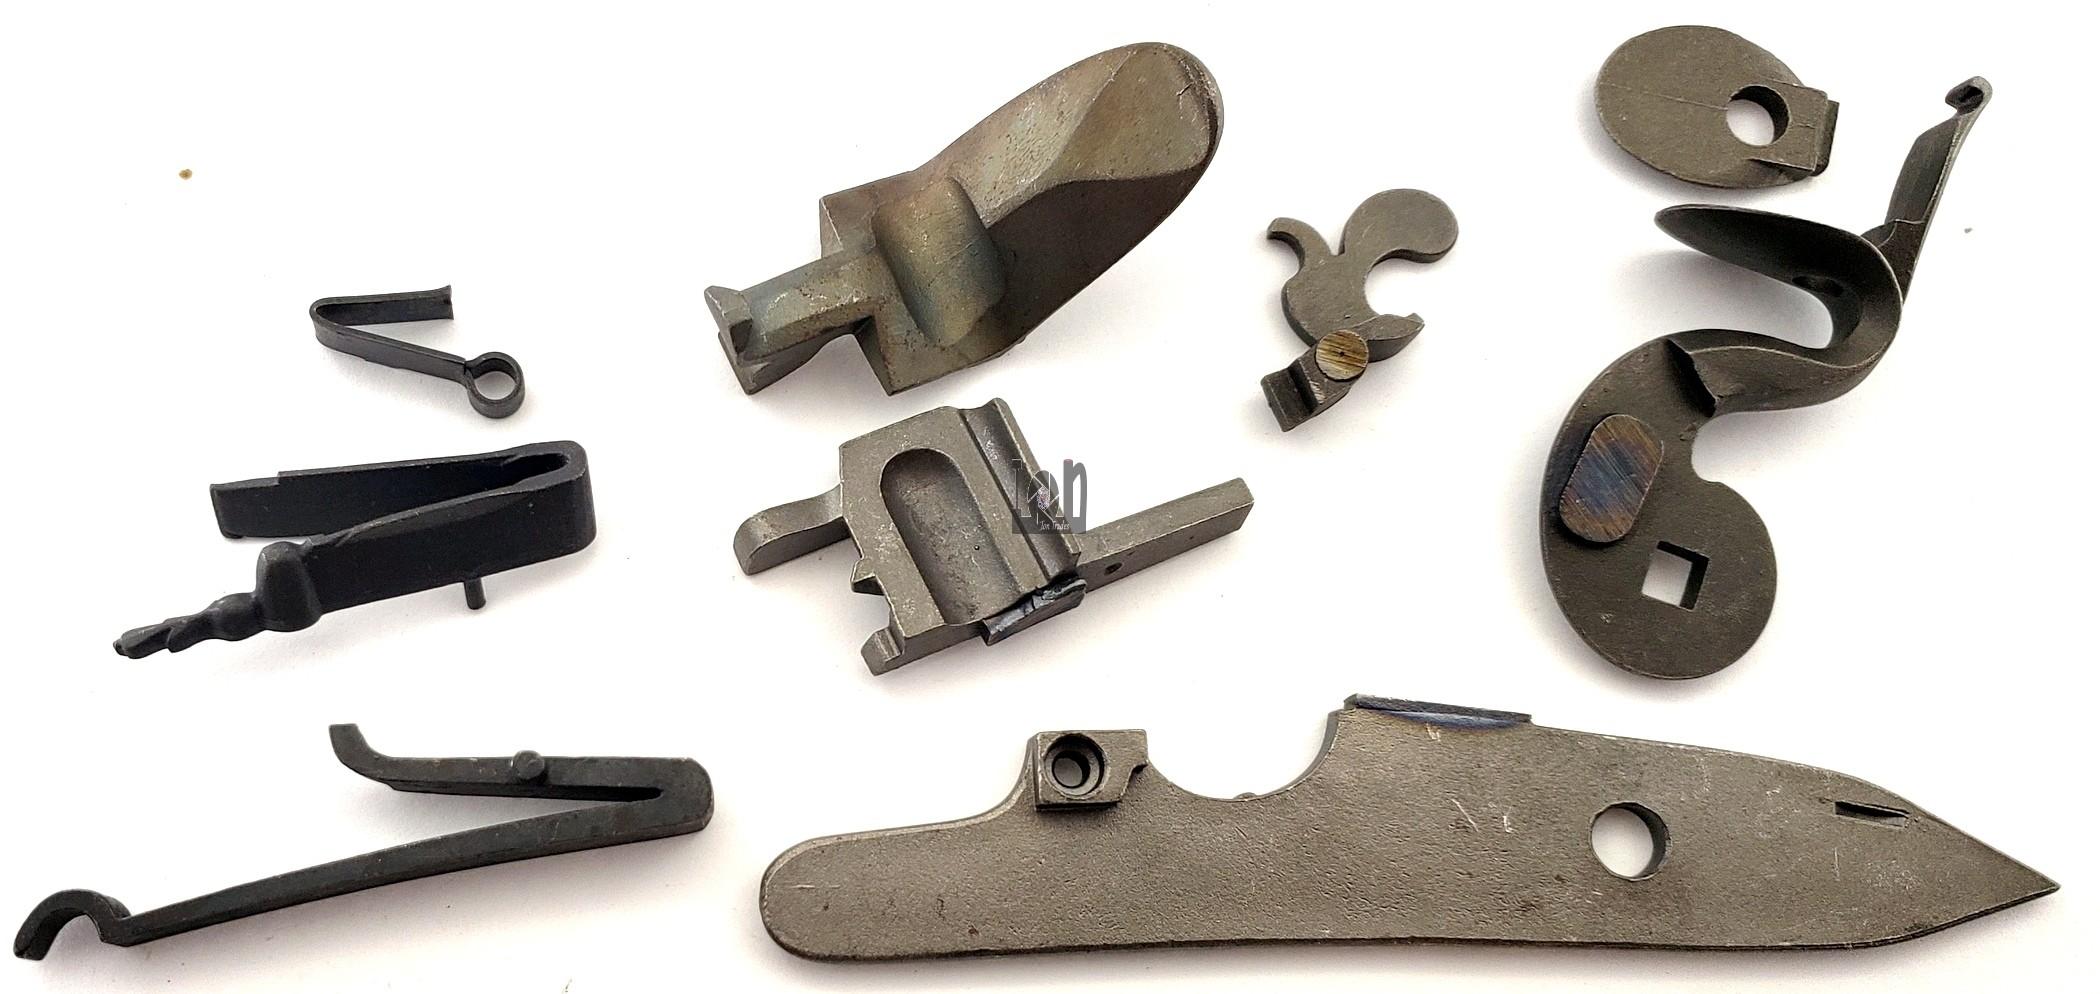 Siler Style Flintlock Flint Lock Kit Muzzloader Pieces and Parts Lot